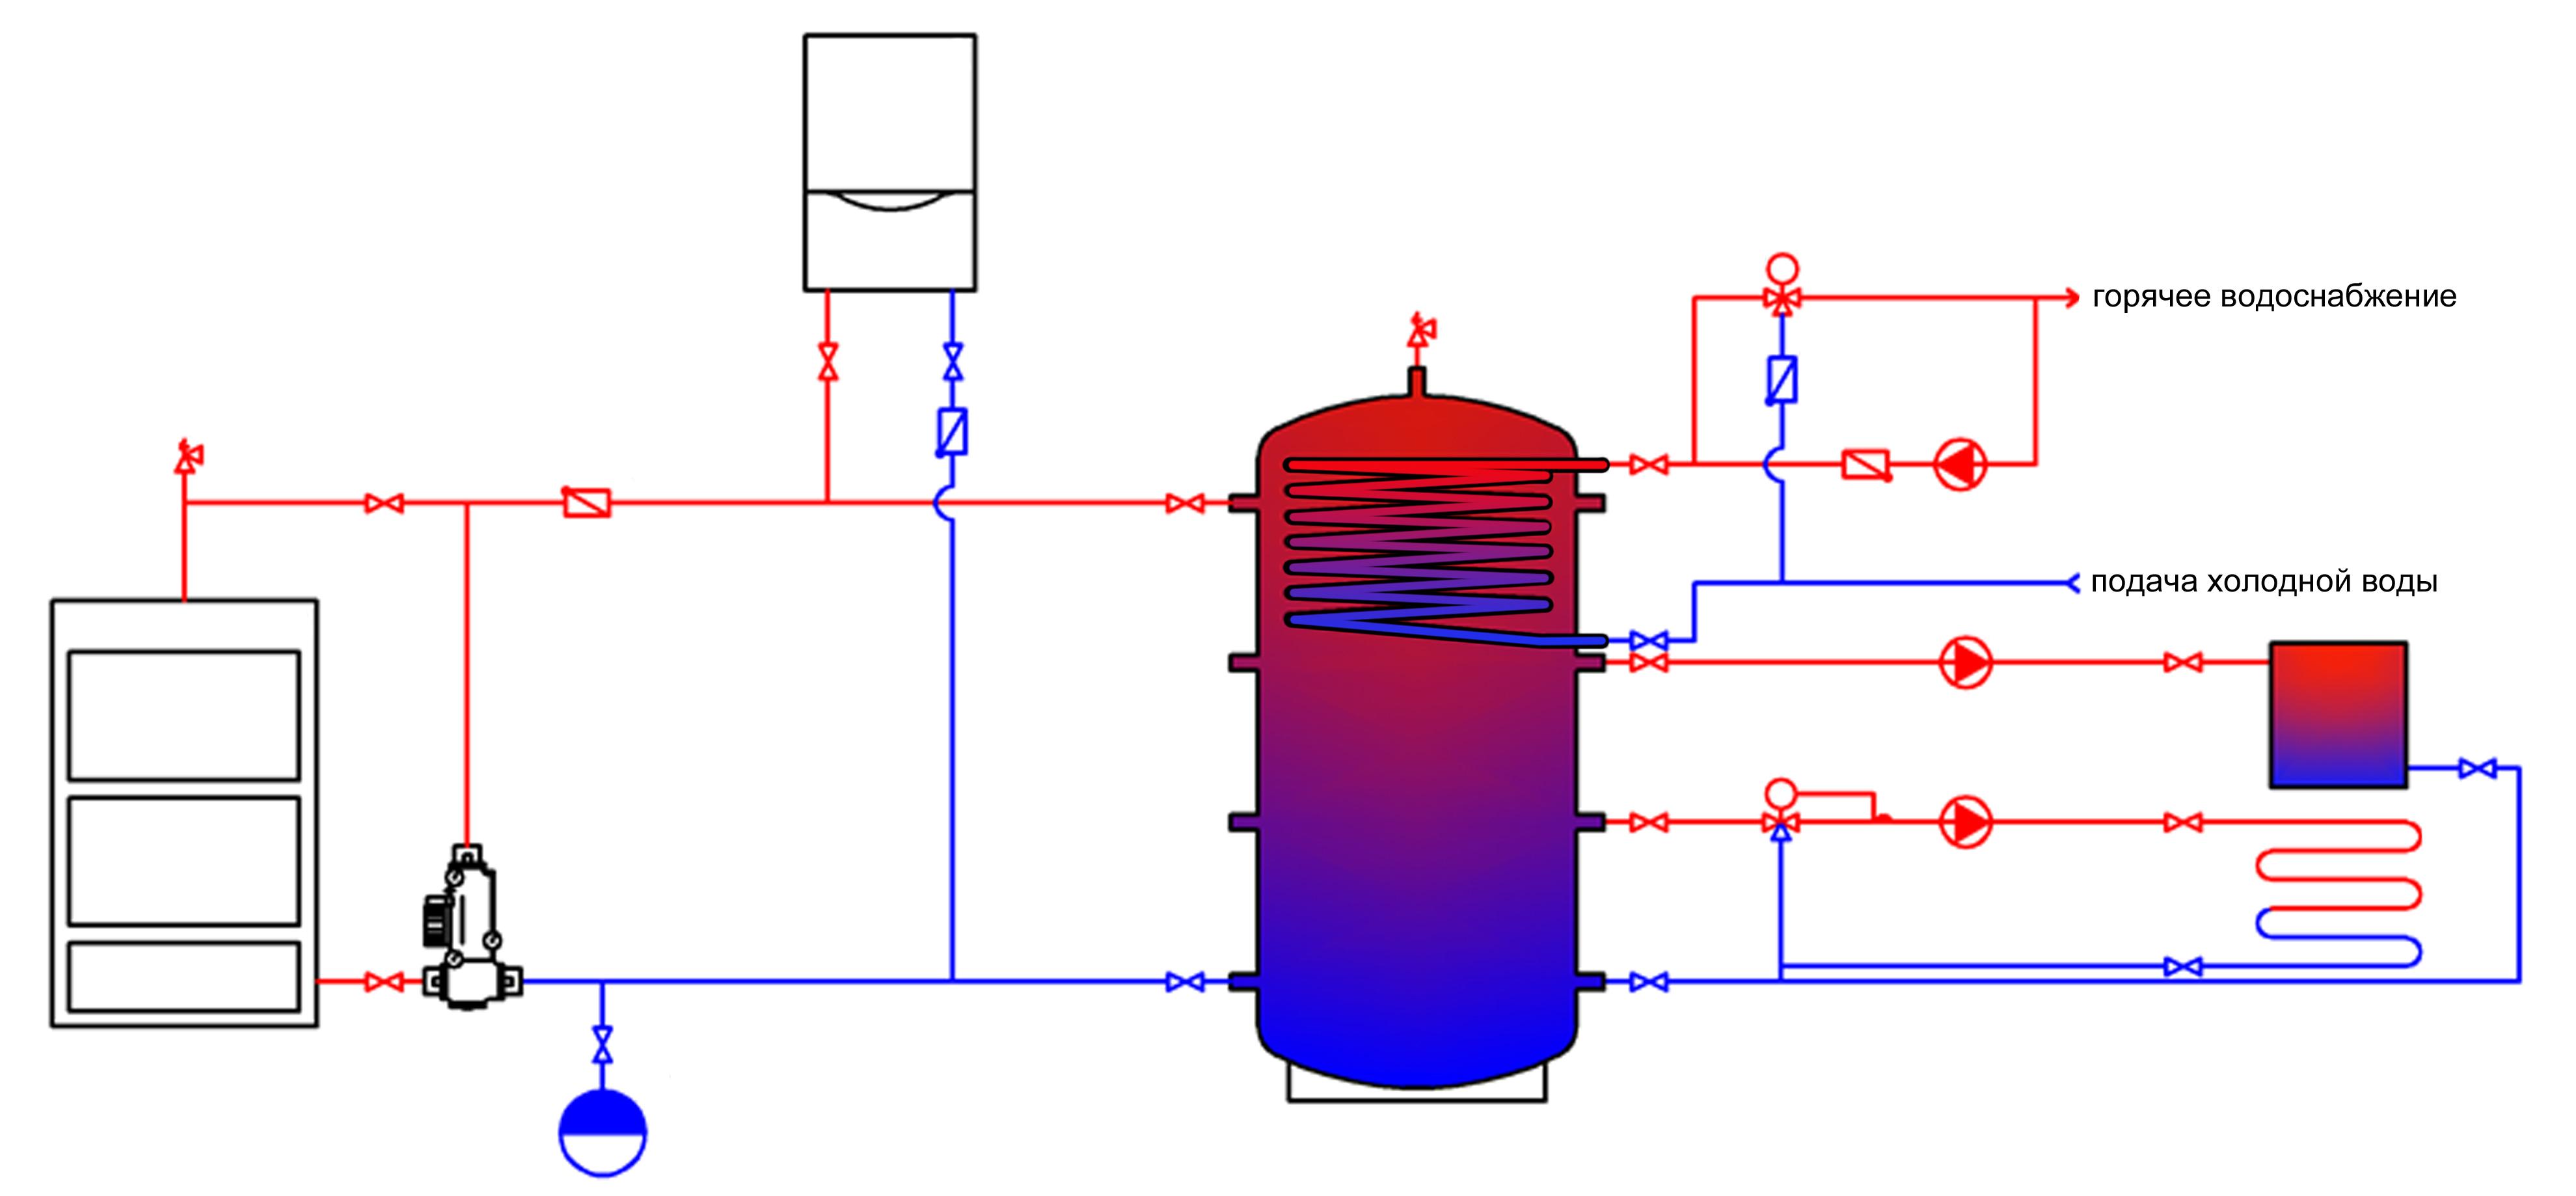 Схема подключения теплообменника в системе отопления Уплотнения теплообменника Alfa Laval T8-MFM Ачинск